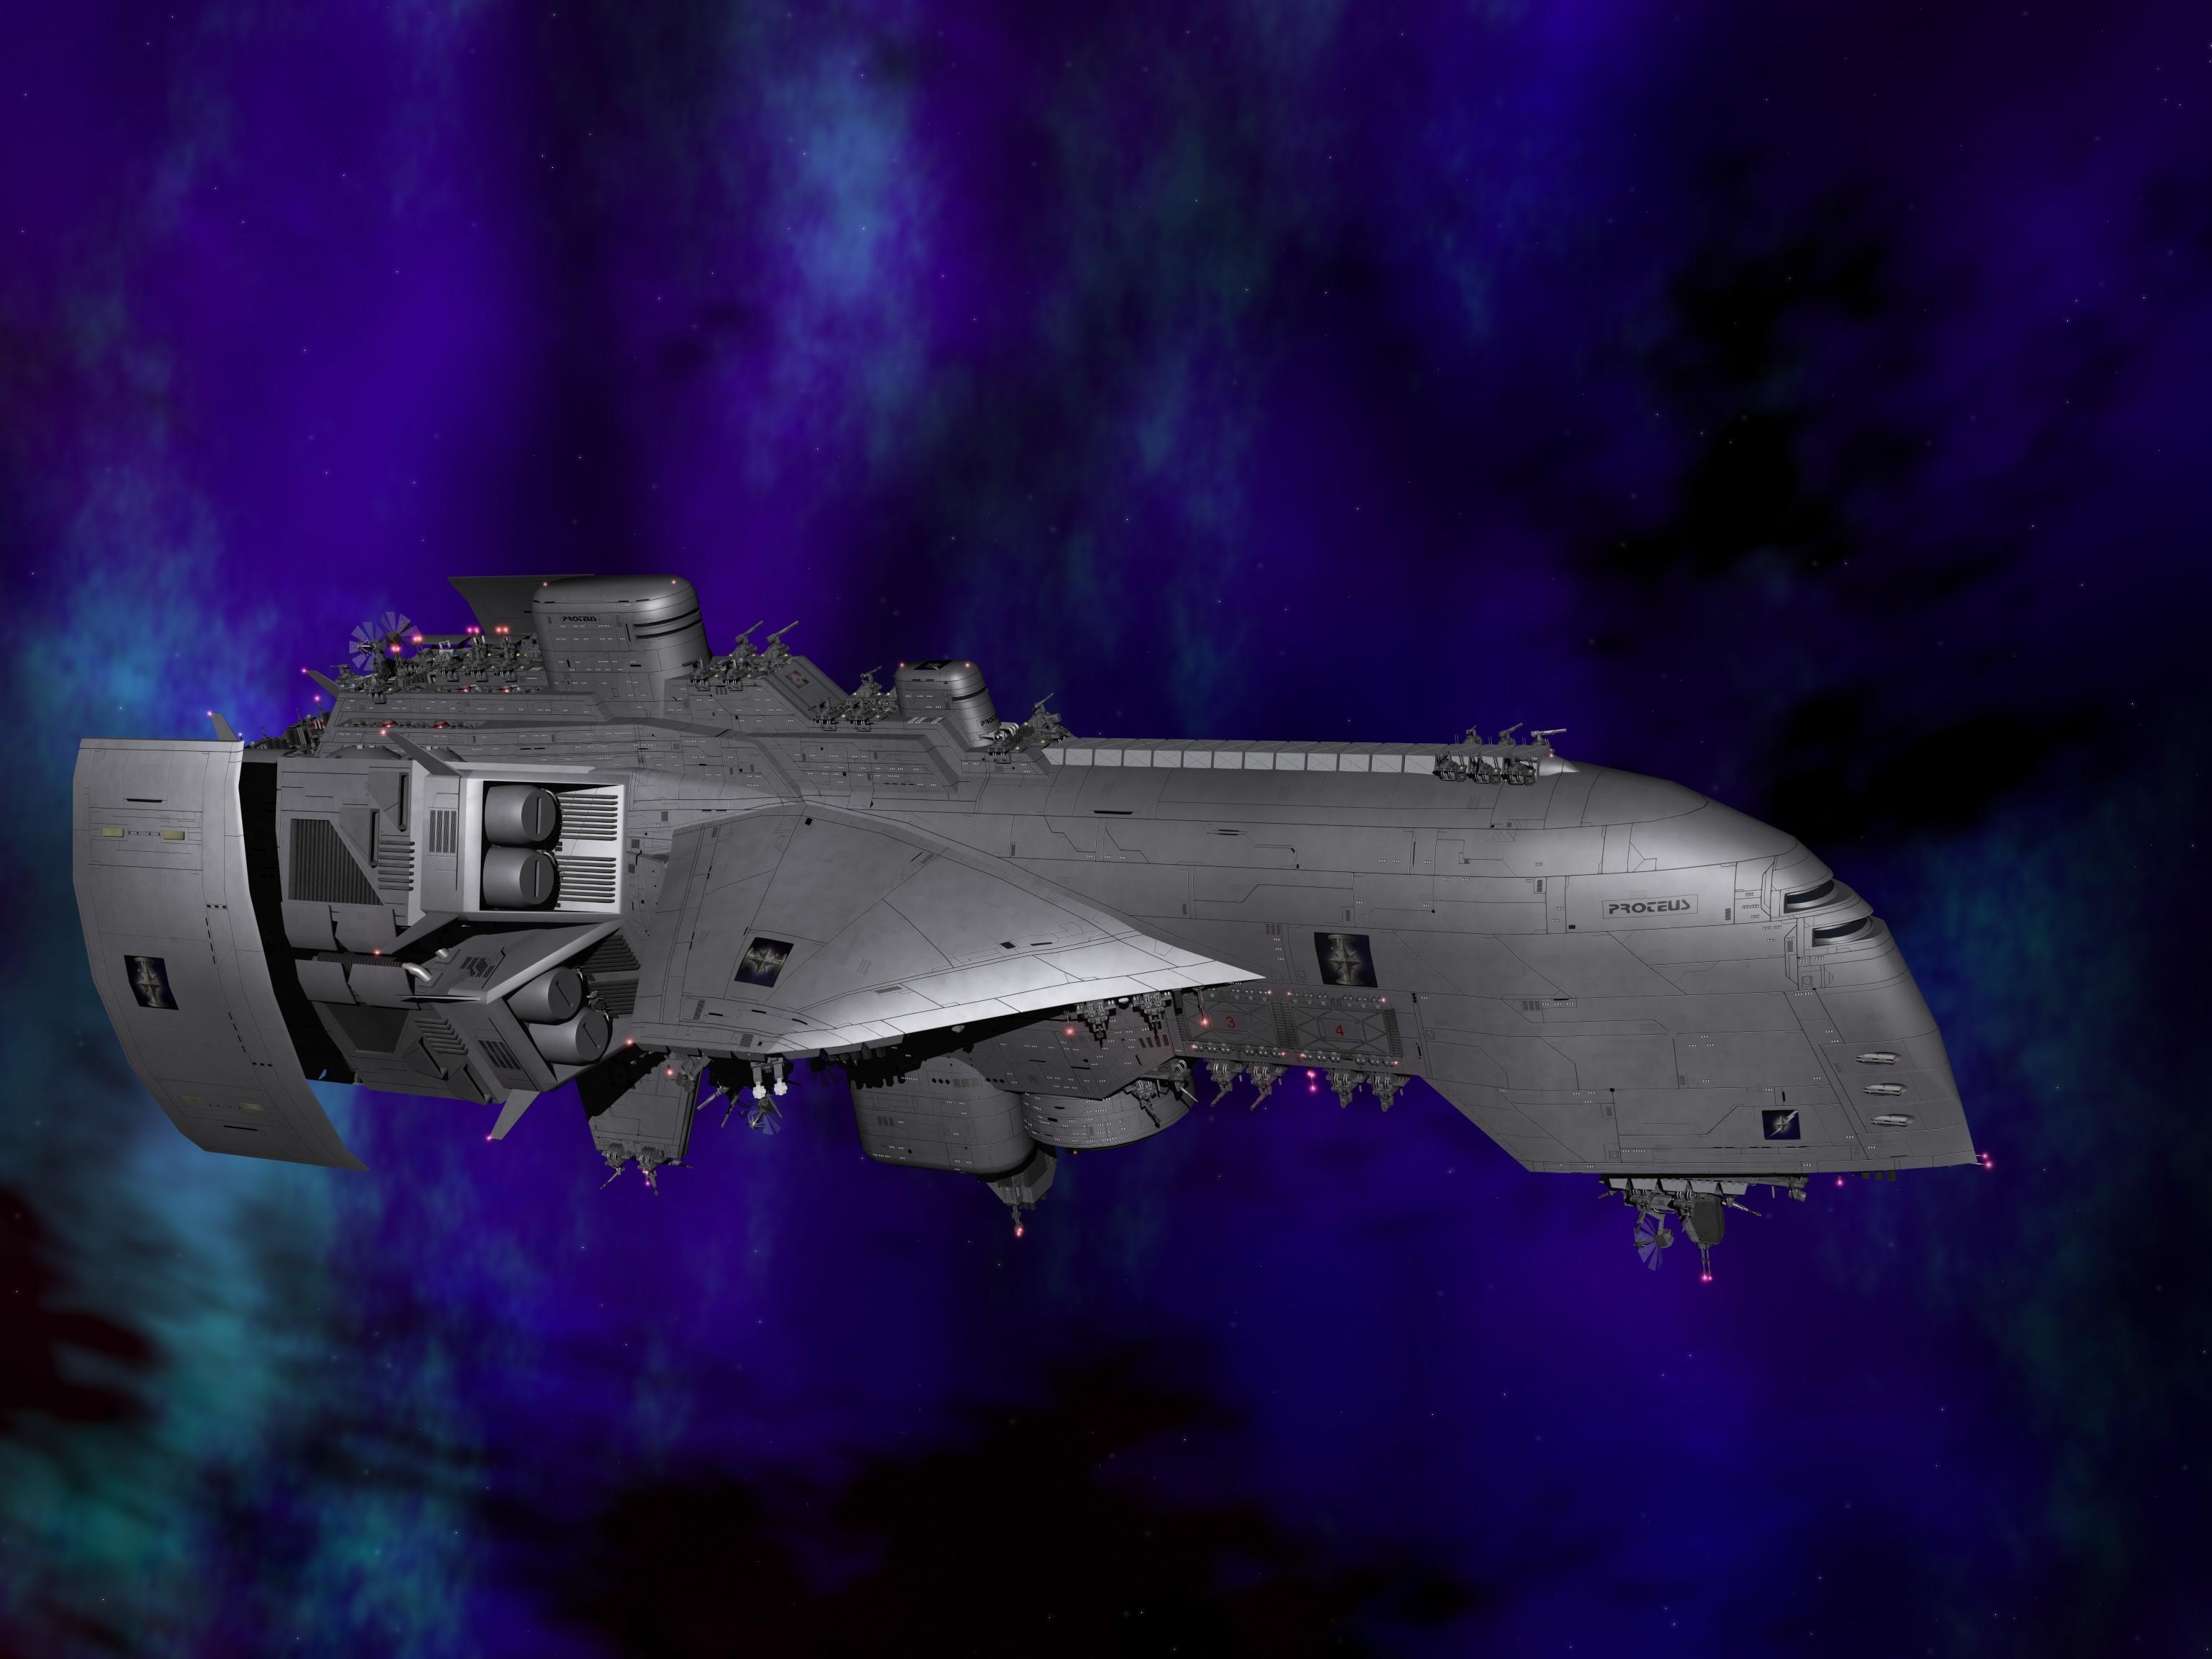 proteus_nebula1.jpg